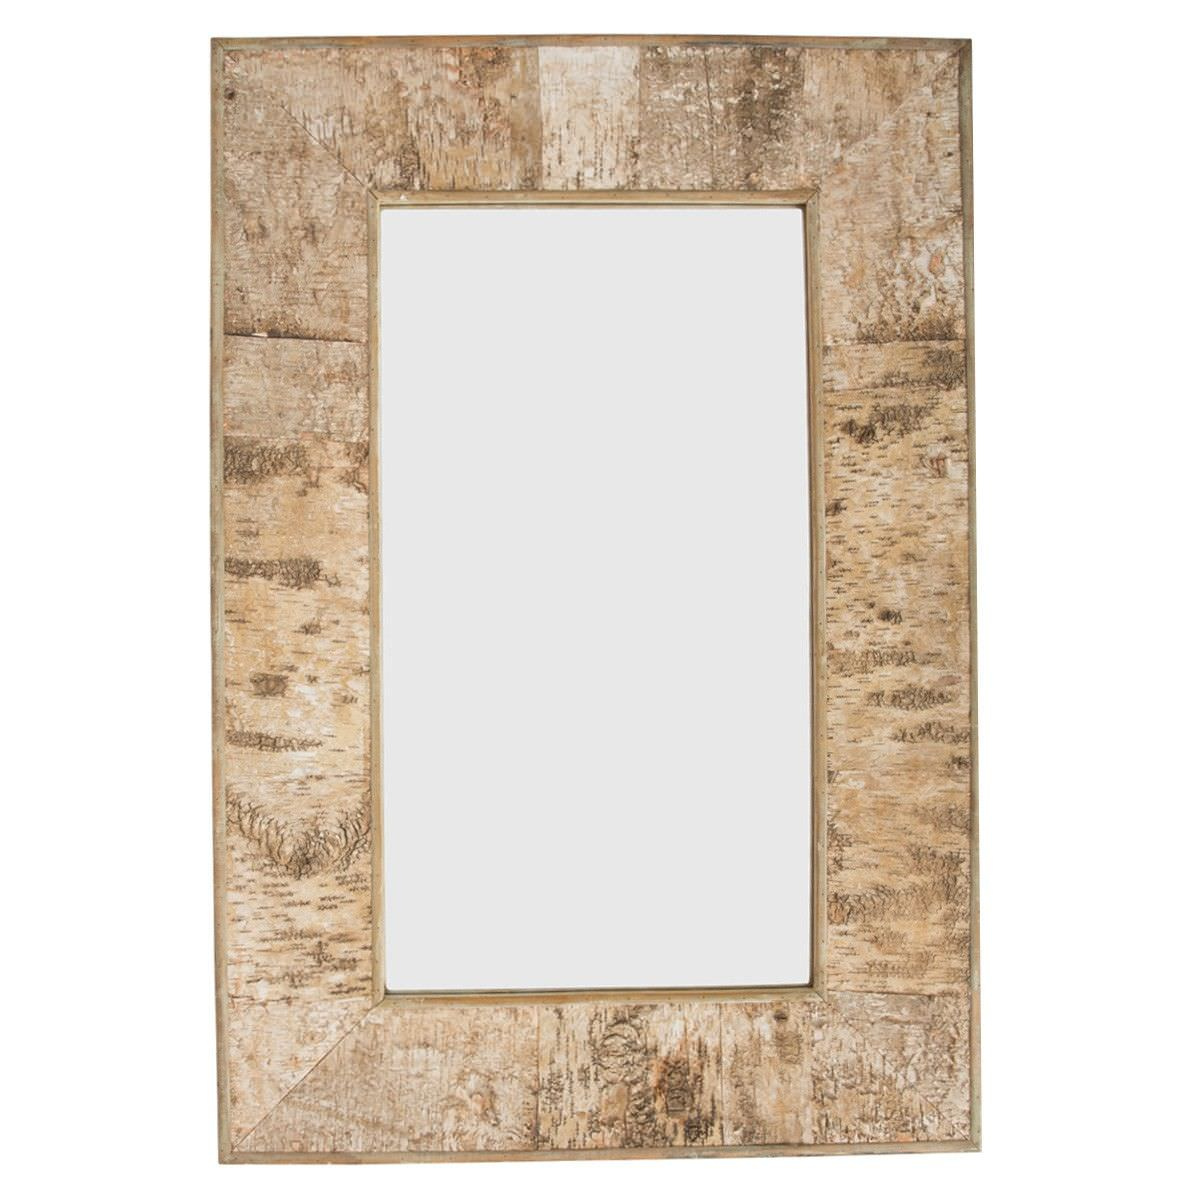 Burford Birch Bark Frame Rectangular Wall Mirror, 120cm